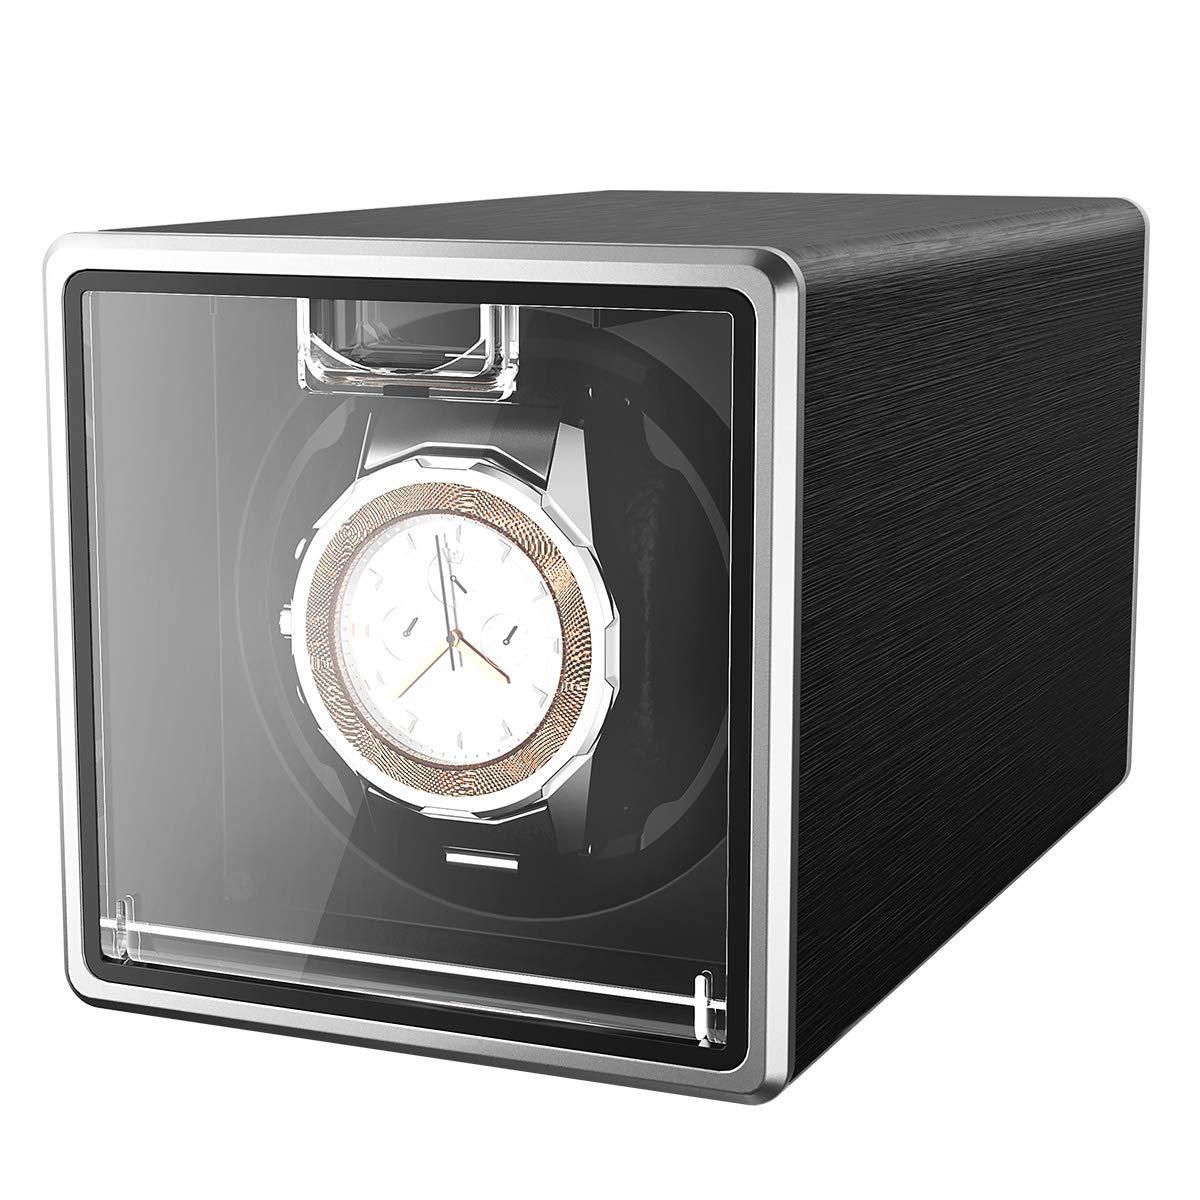 9f7f54c7be88 Mejor valorados en Cajas giratorias para relojes   Opiniones útiles ...